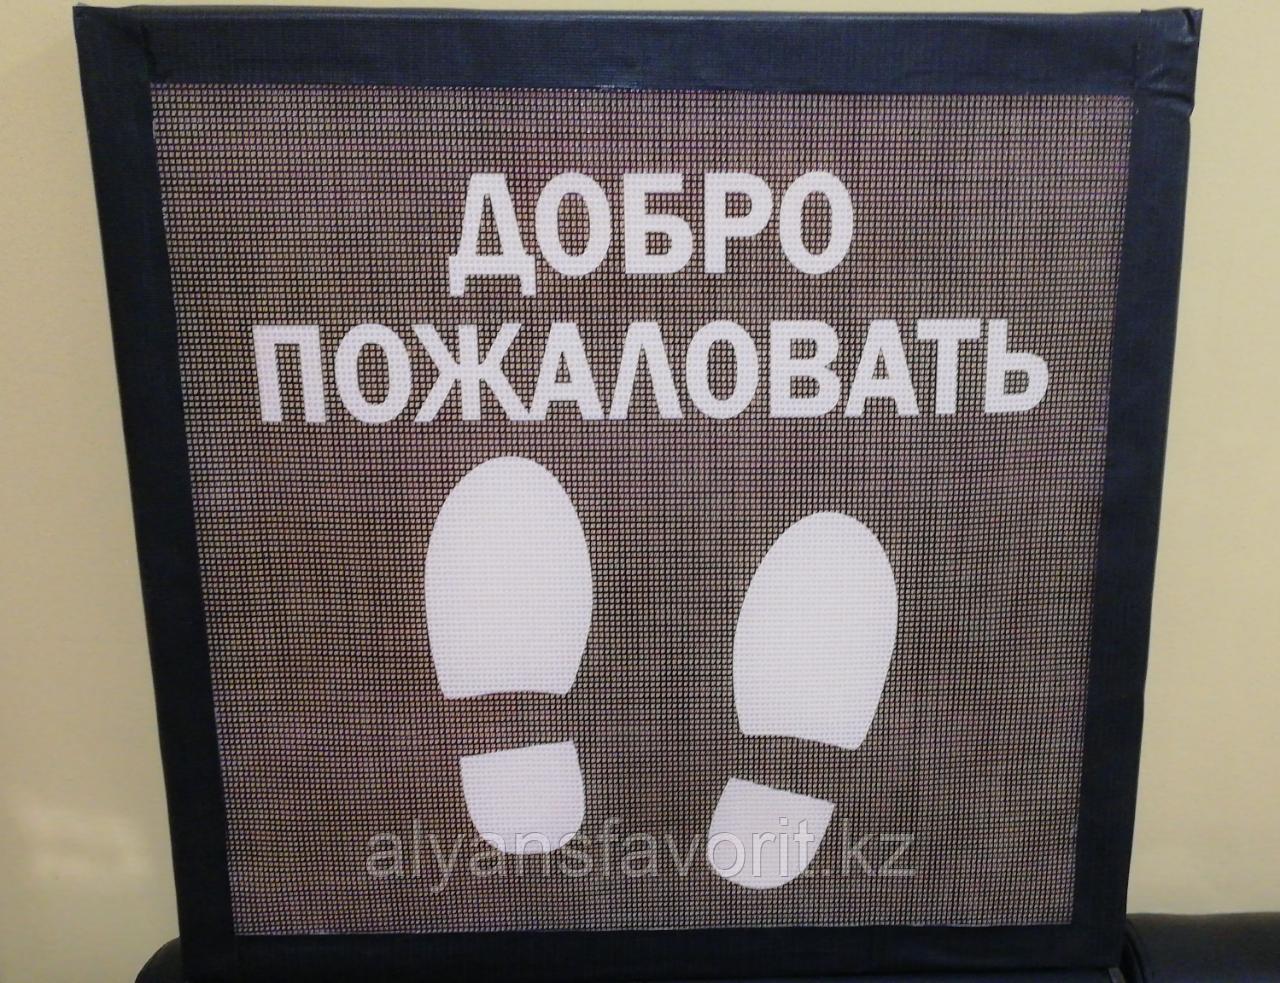 Дезинфицирующий коврик (дез коврик) 50*50 см. РК